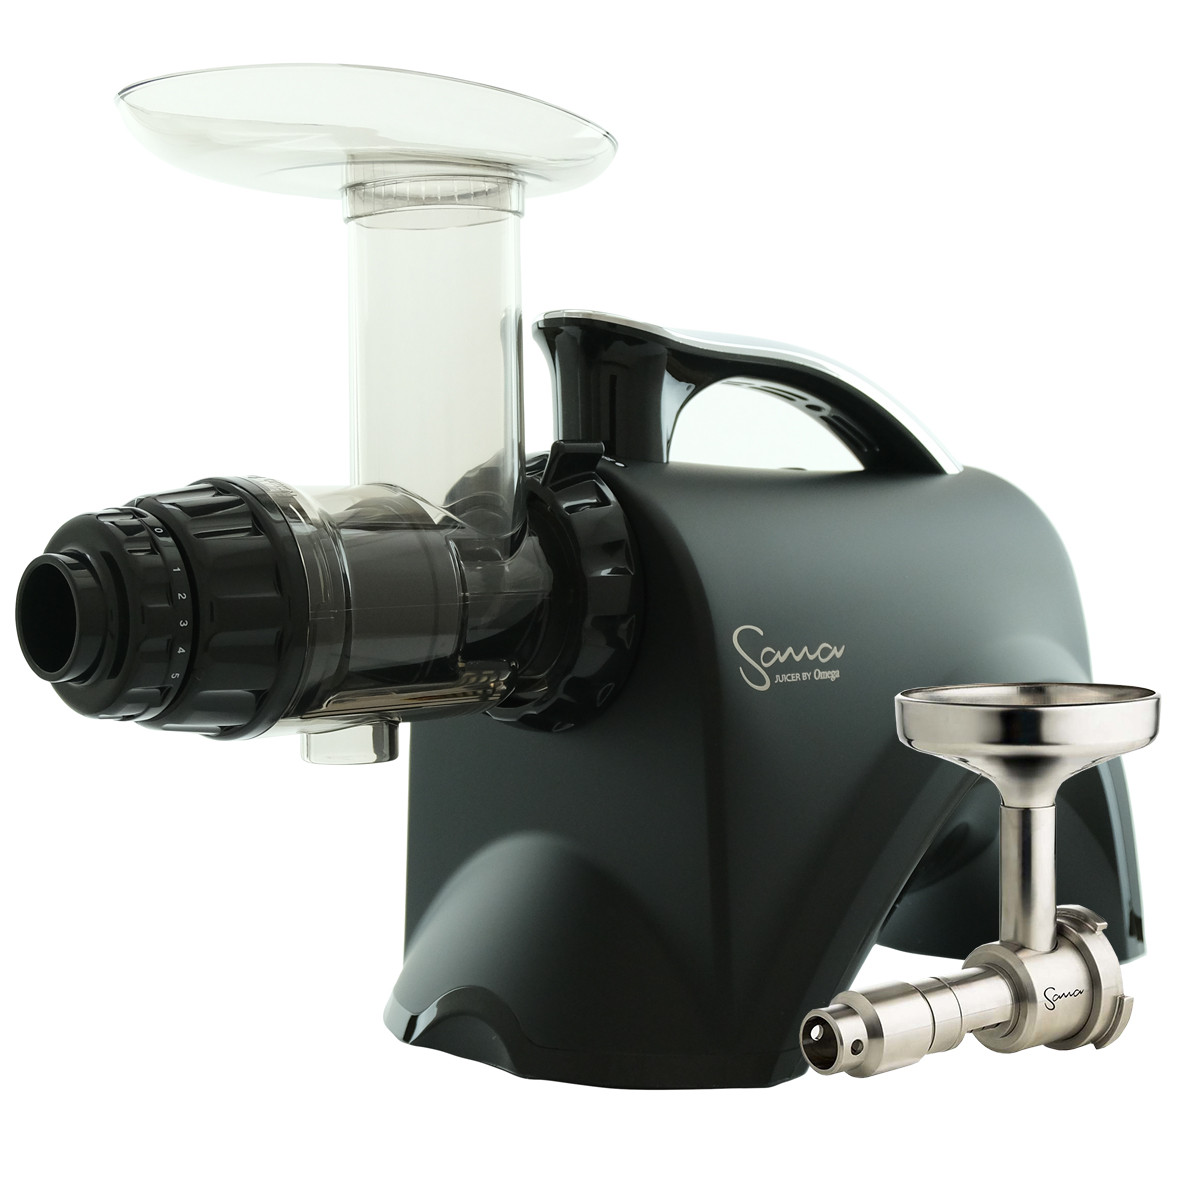 Omega Sana Juicer Black EUJ 606MB with Oil Extractor